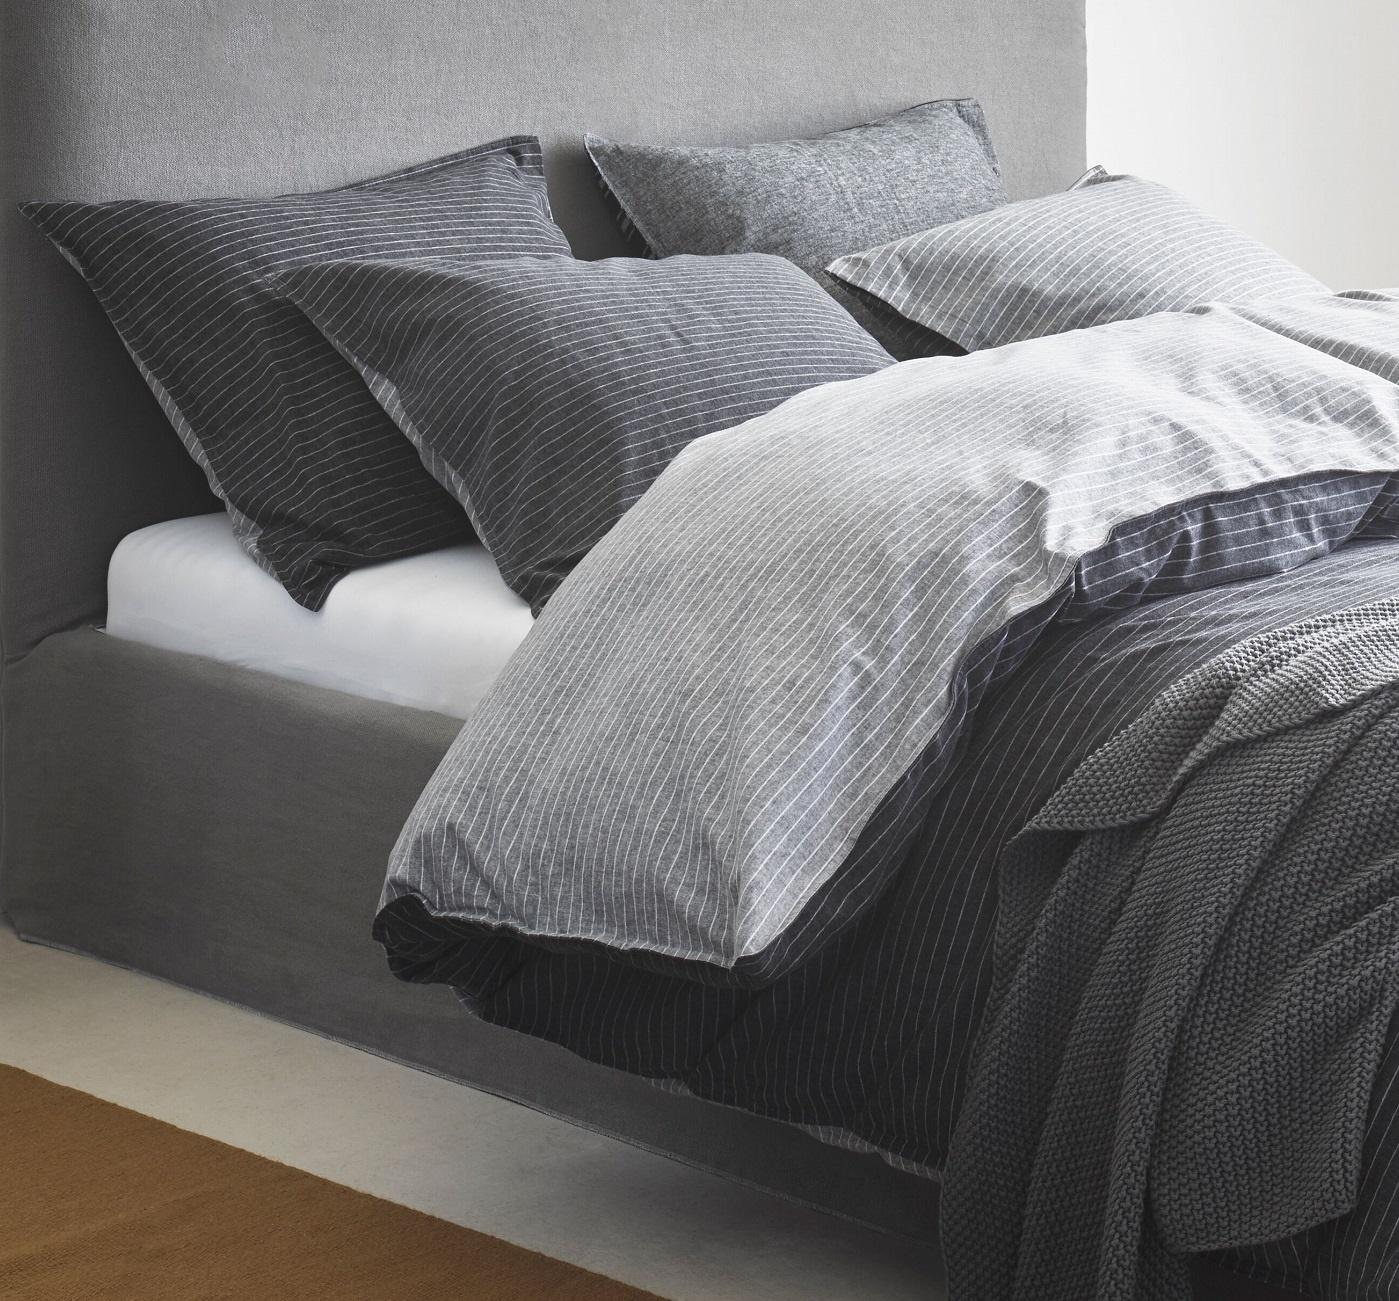 marc o 39 polo jensen flanellbettw sche black. Black Bedroom Furniture Sets. Home Design Ideas